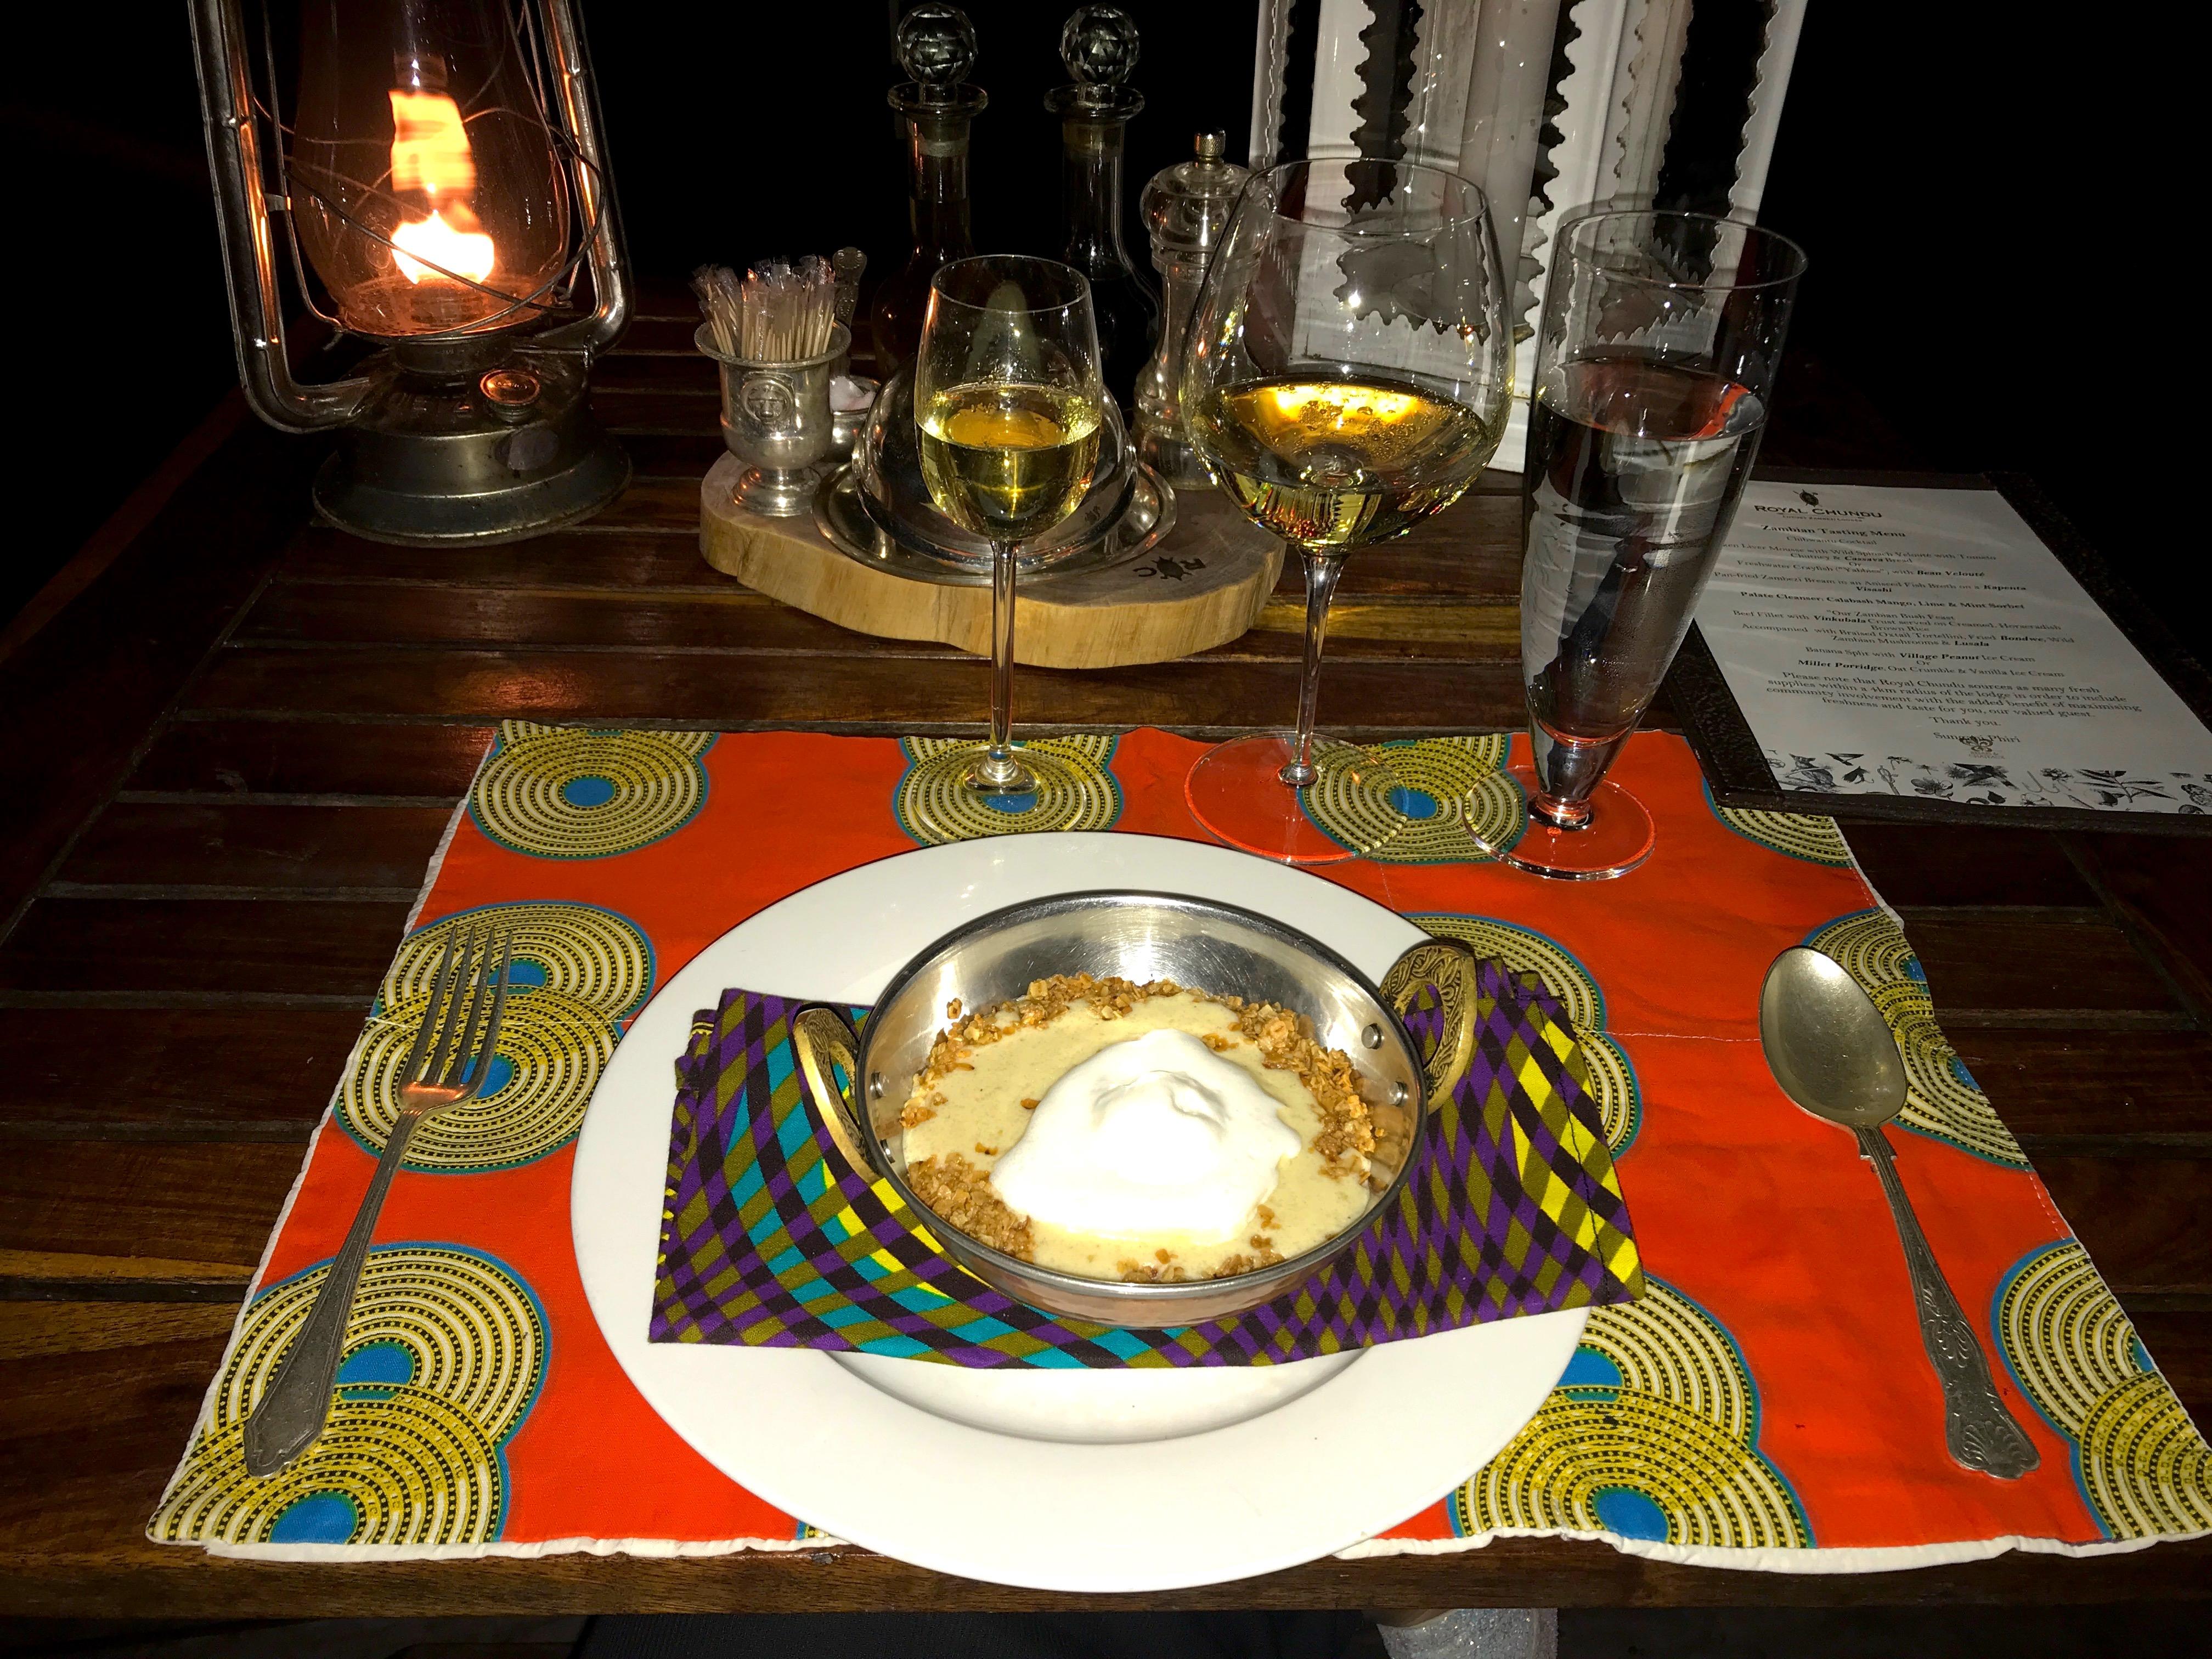 zambian-dinner-royalchundu-zambia-lustforthesublime